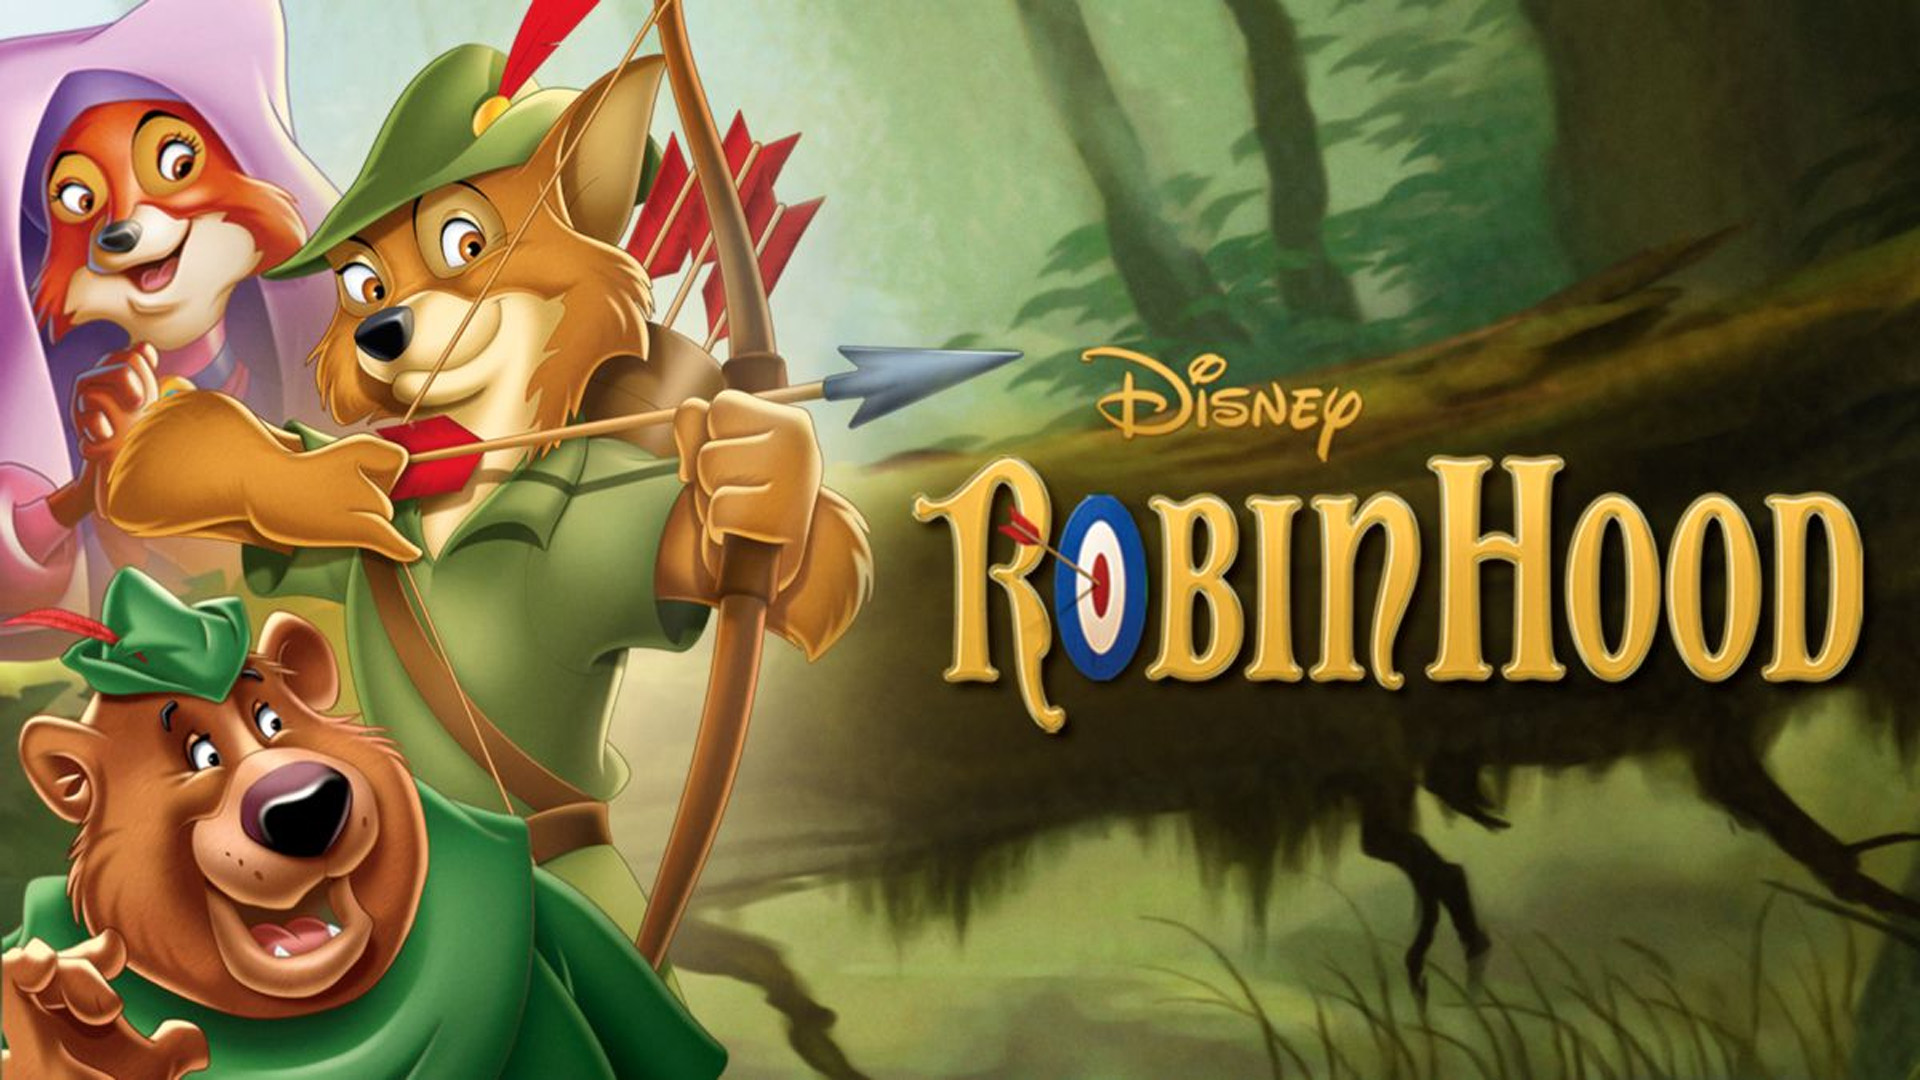 ROBN HOOD